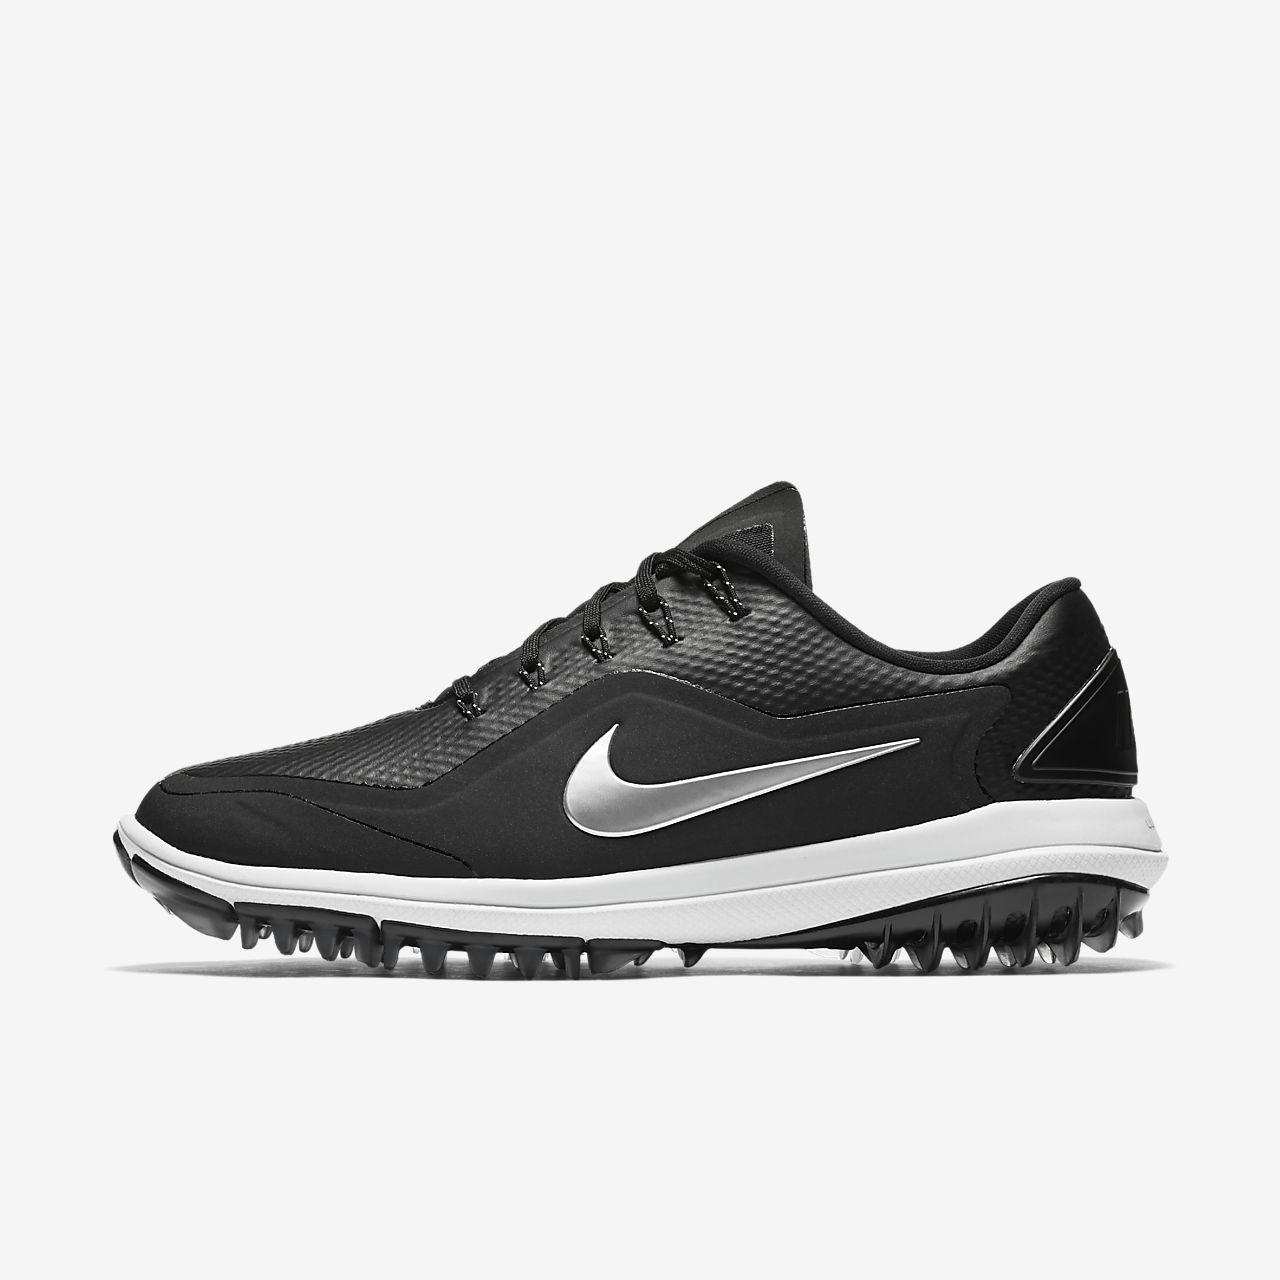 cheap for discount 9ce8d 8db13 ... Scarpa da golf Nike Lunar Control Vapor 2 - Donna